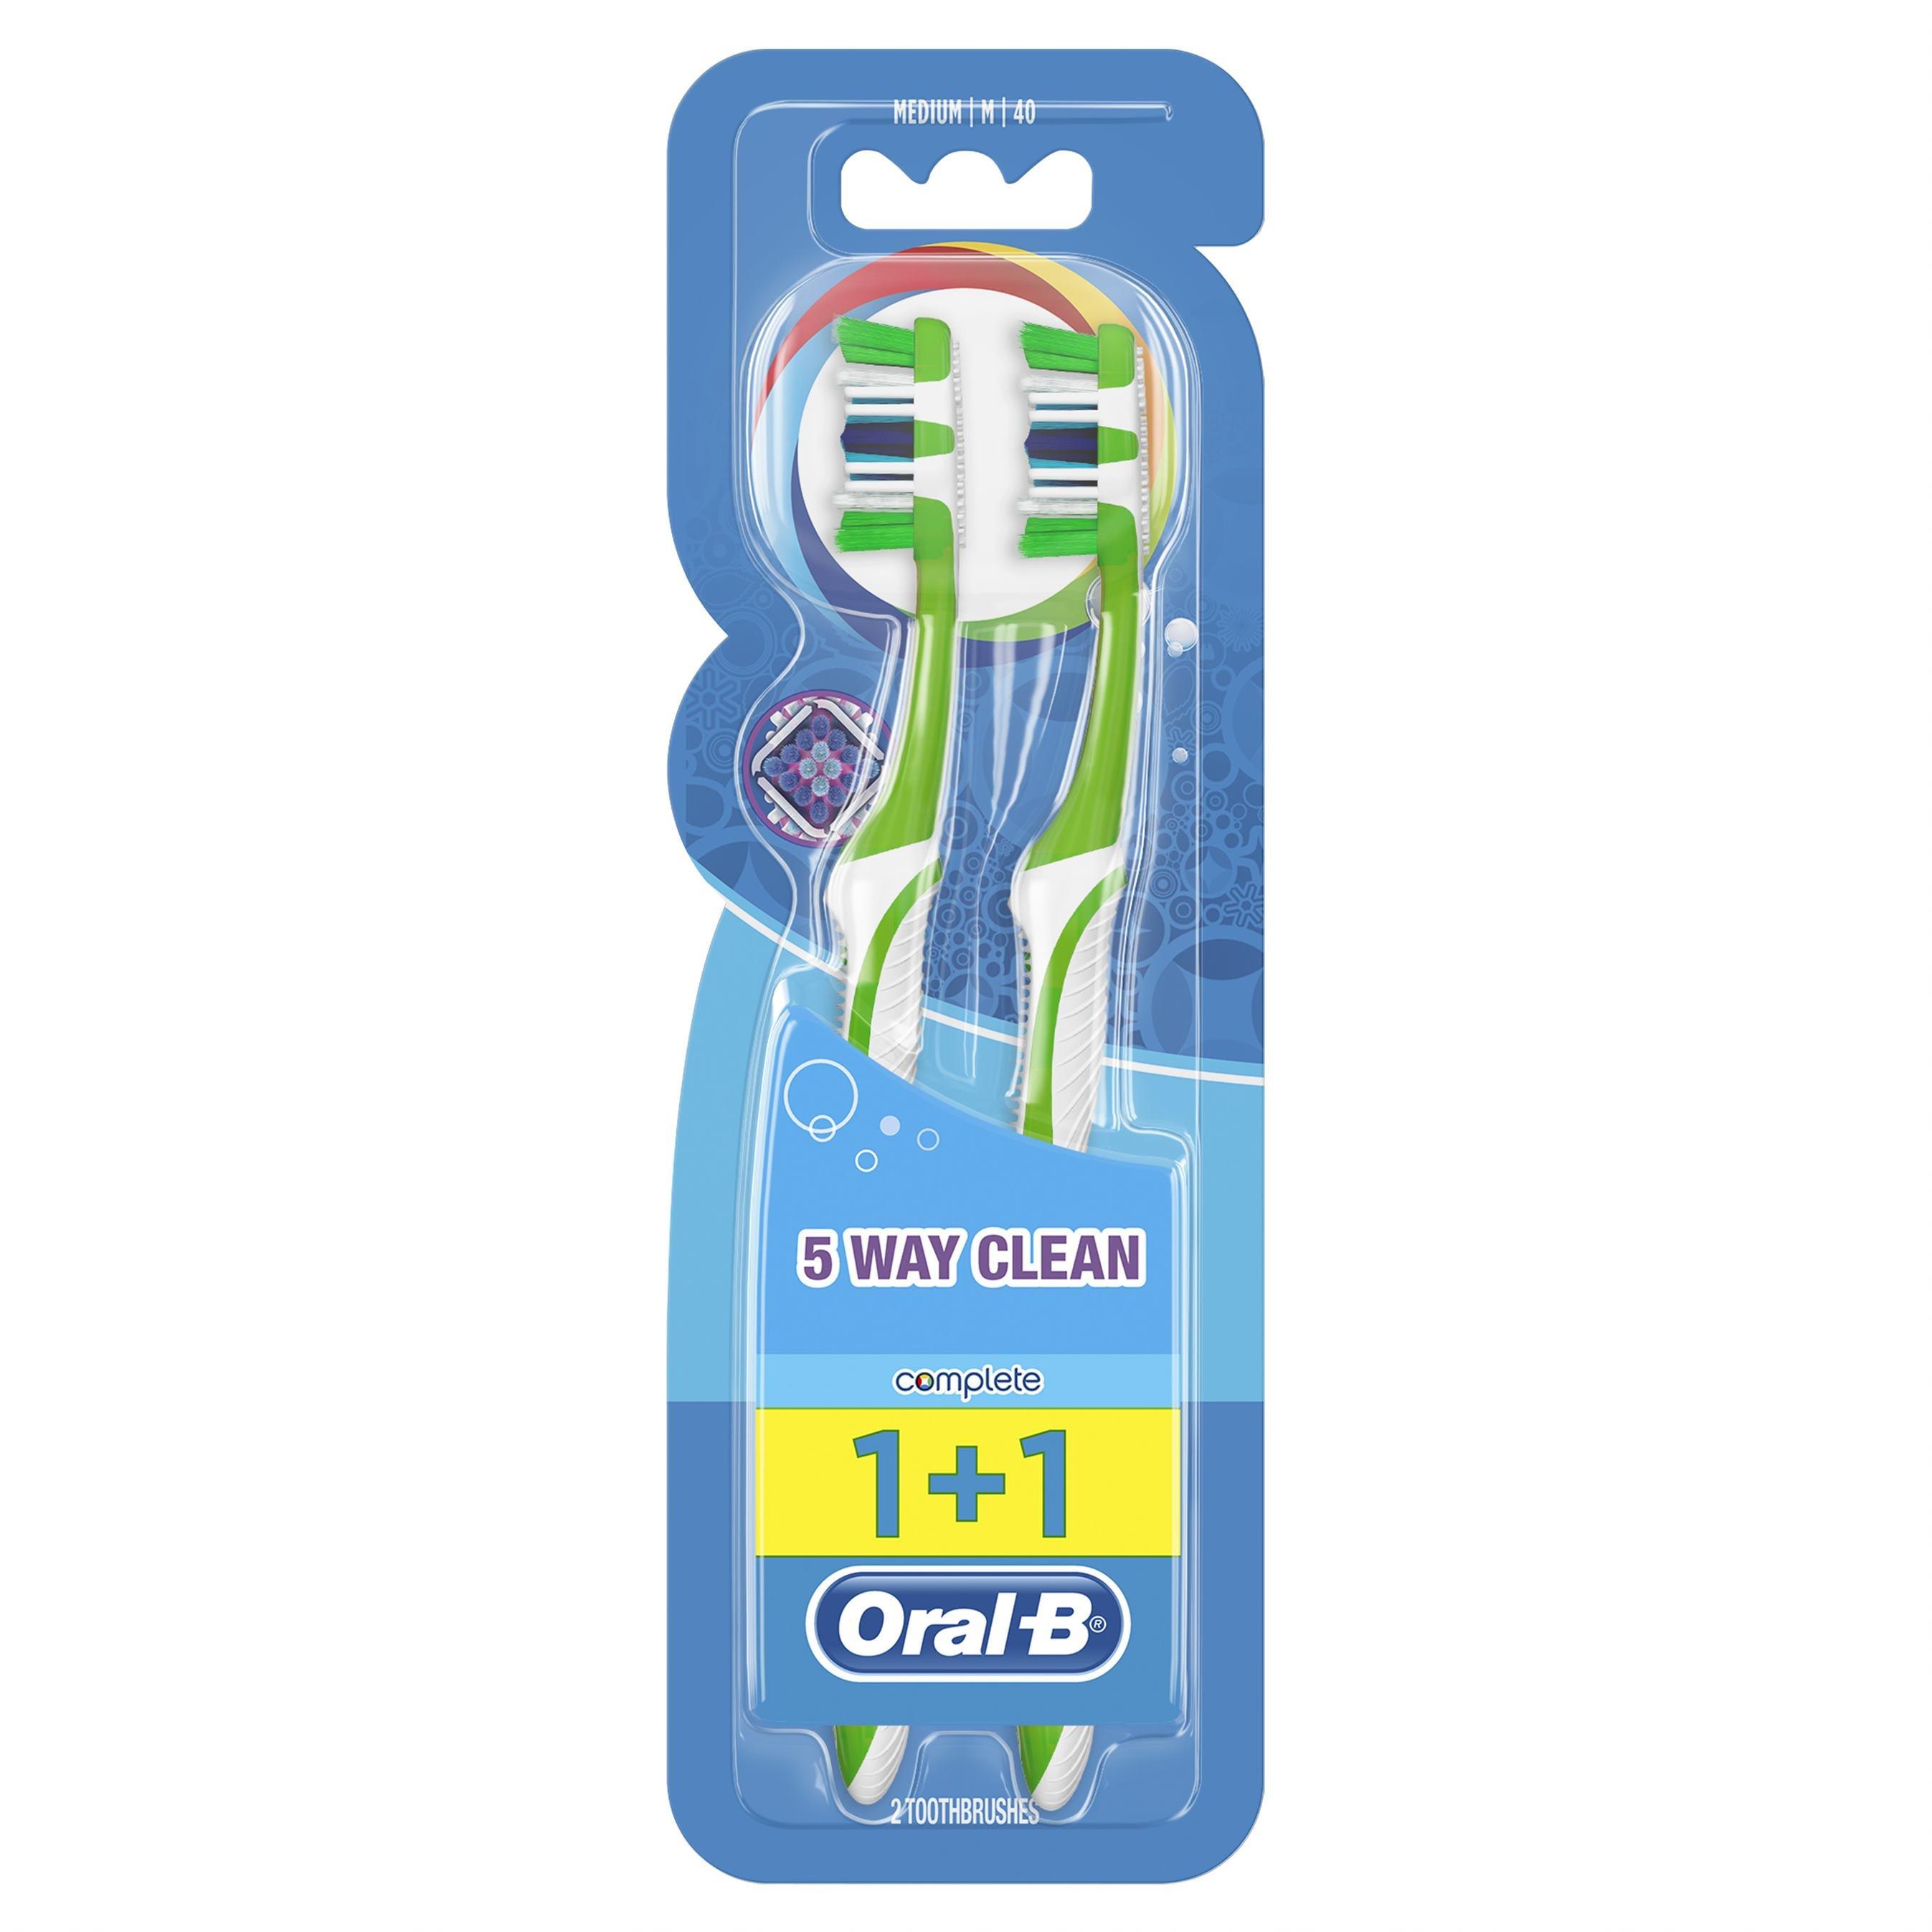 Oral-B Complete 5 Way Clean Οδοντόβουρτσα 40 Μέτρια 1+1 δώρο – Μπλε – Πράσινο